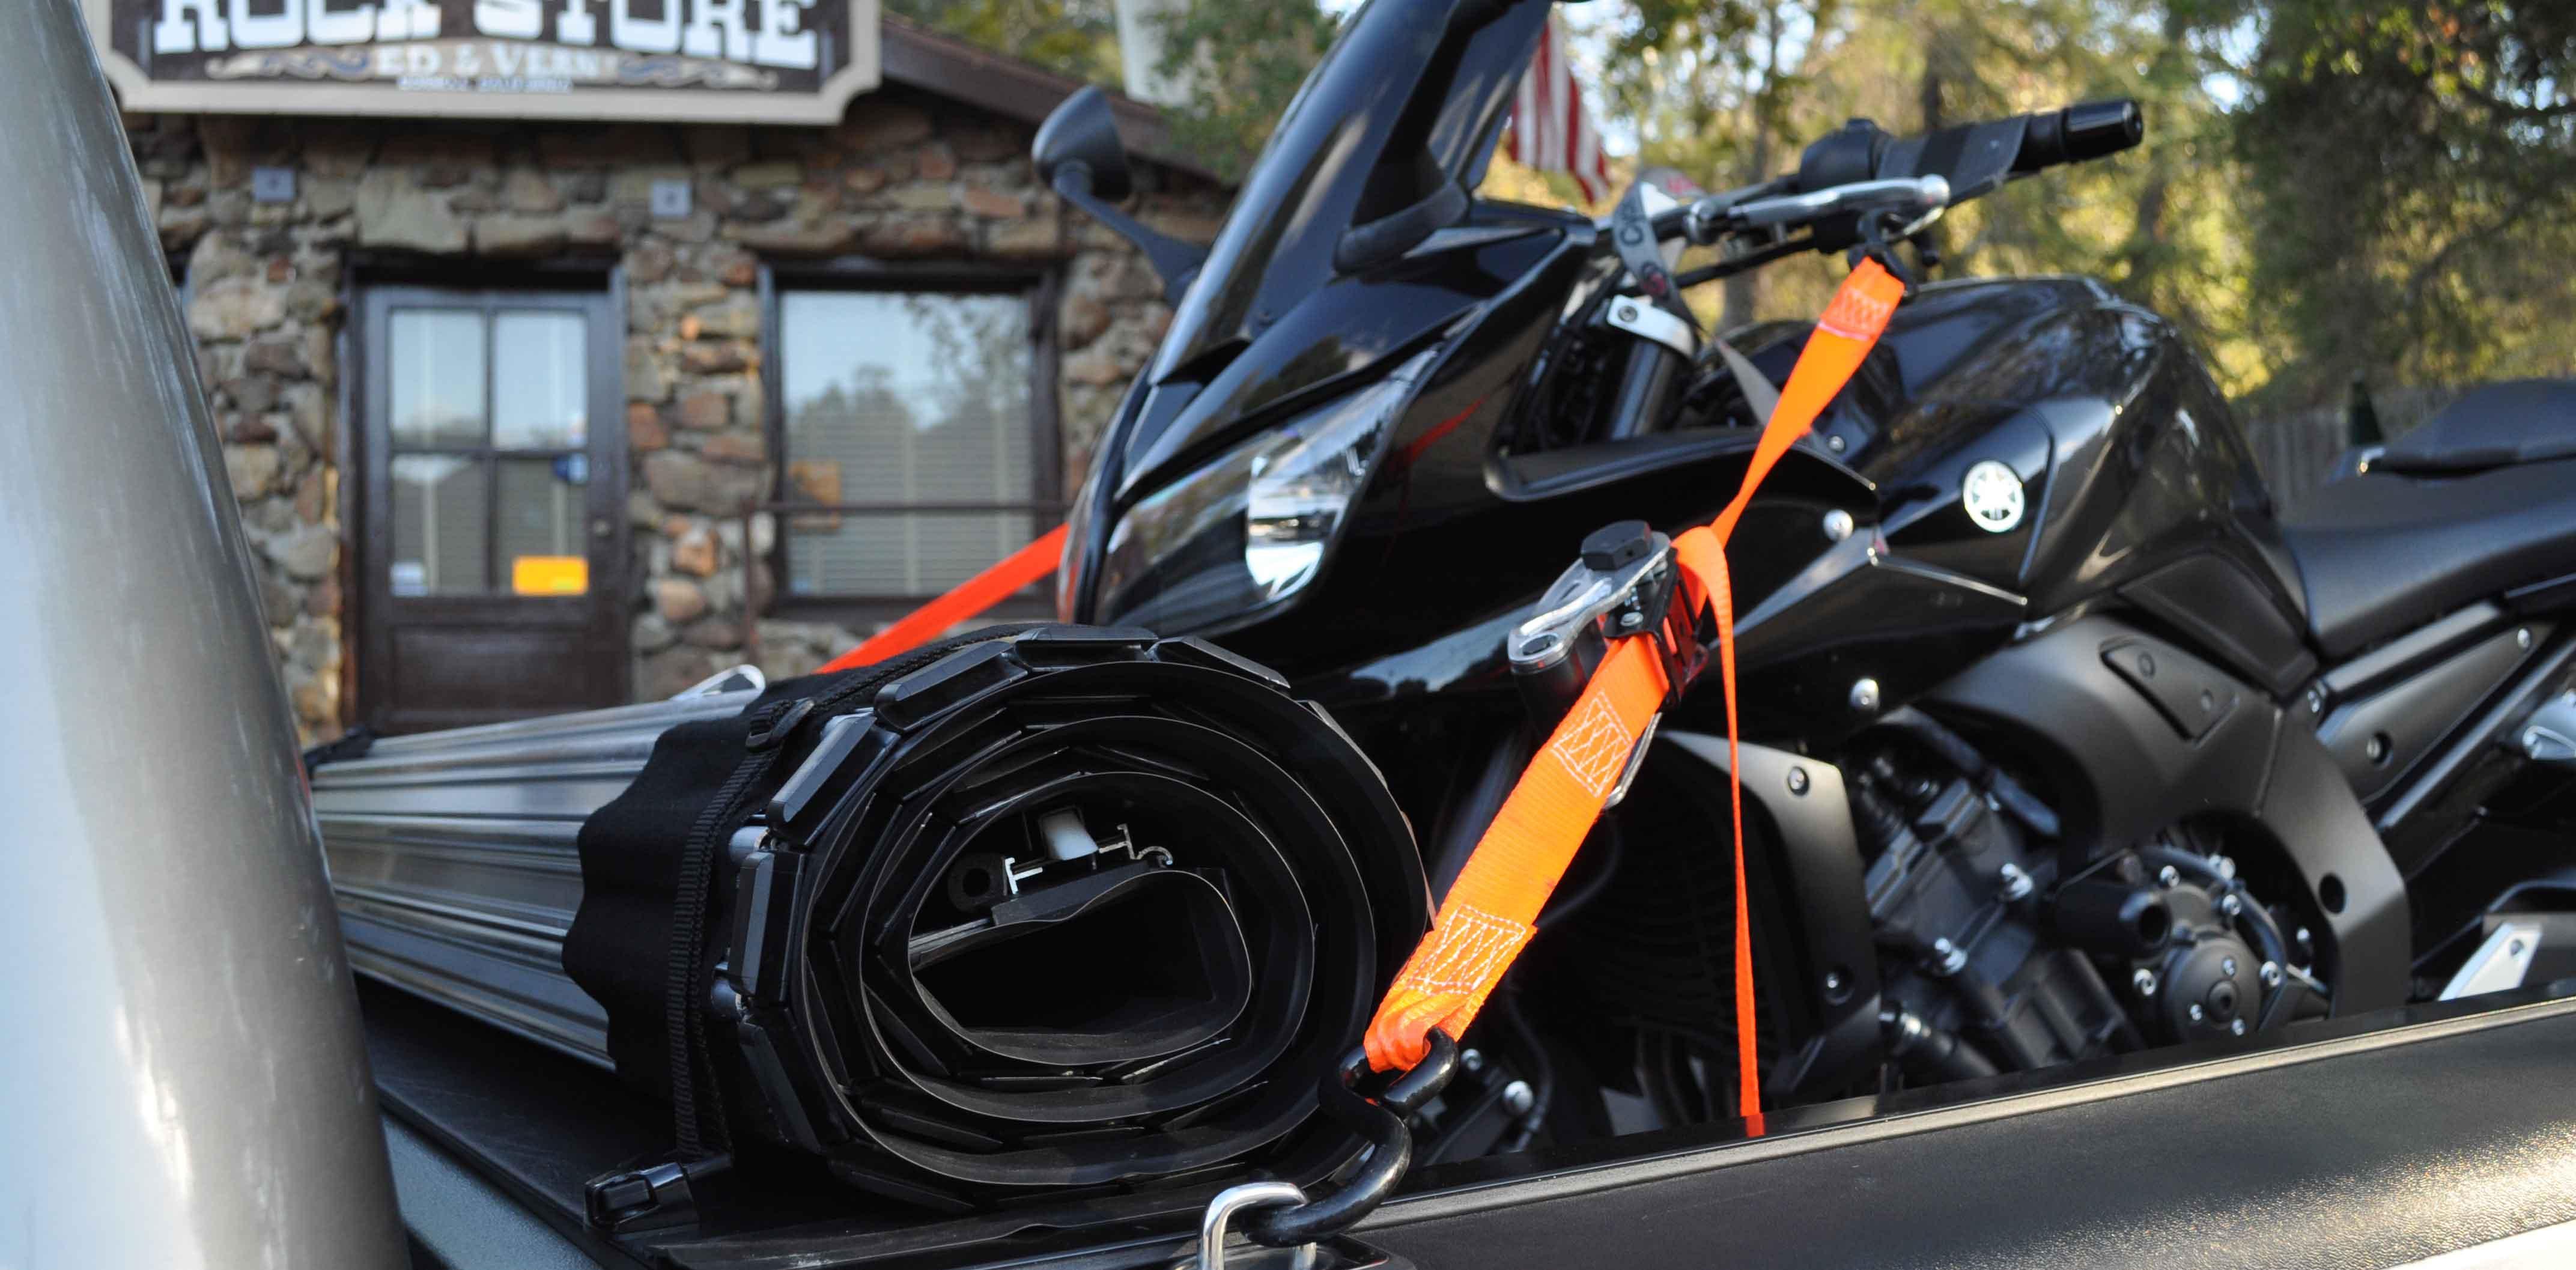 Bak Motorcycle Tonneau Covers 4wheelonline Com